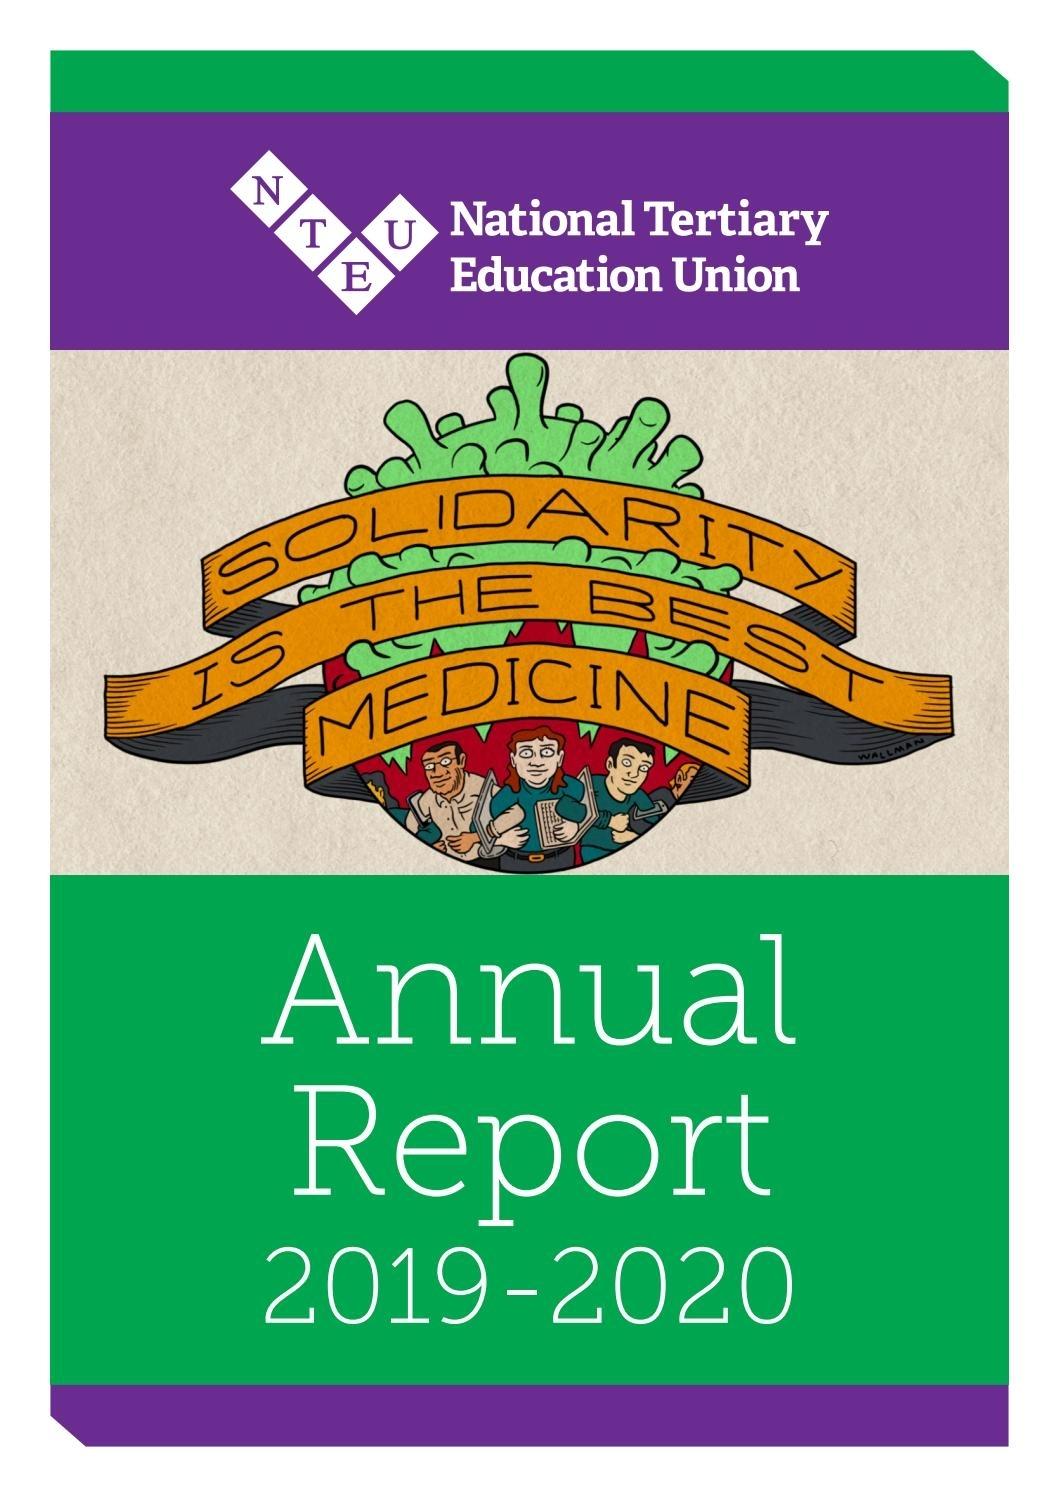 Nteu Annual Report 2019-2020 By Nteu - Issuu